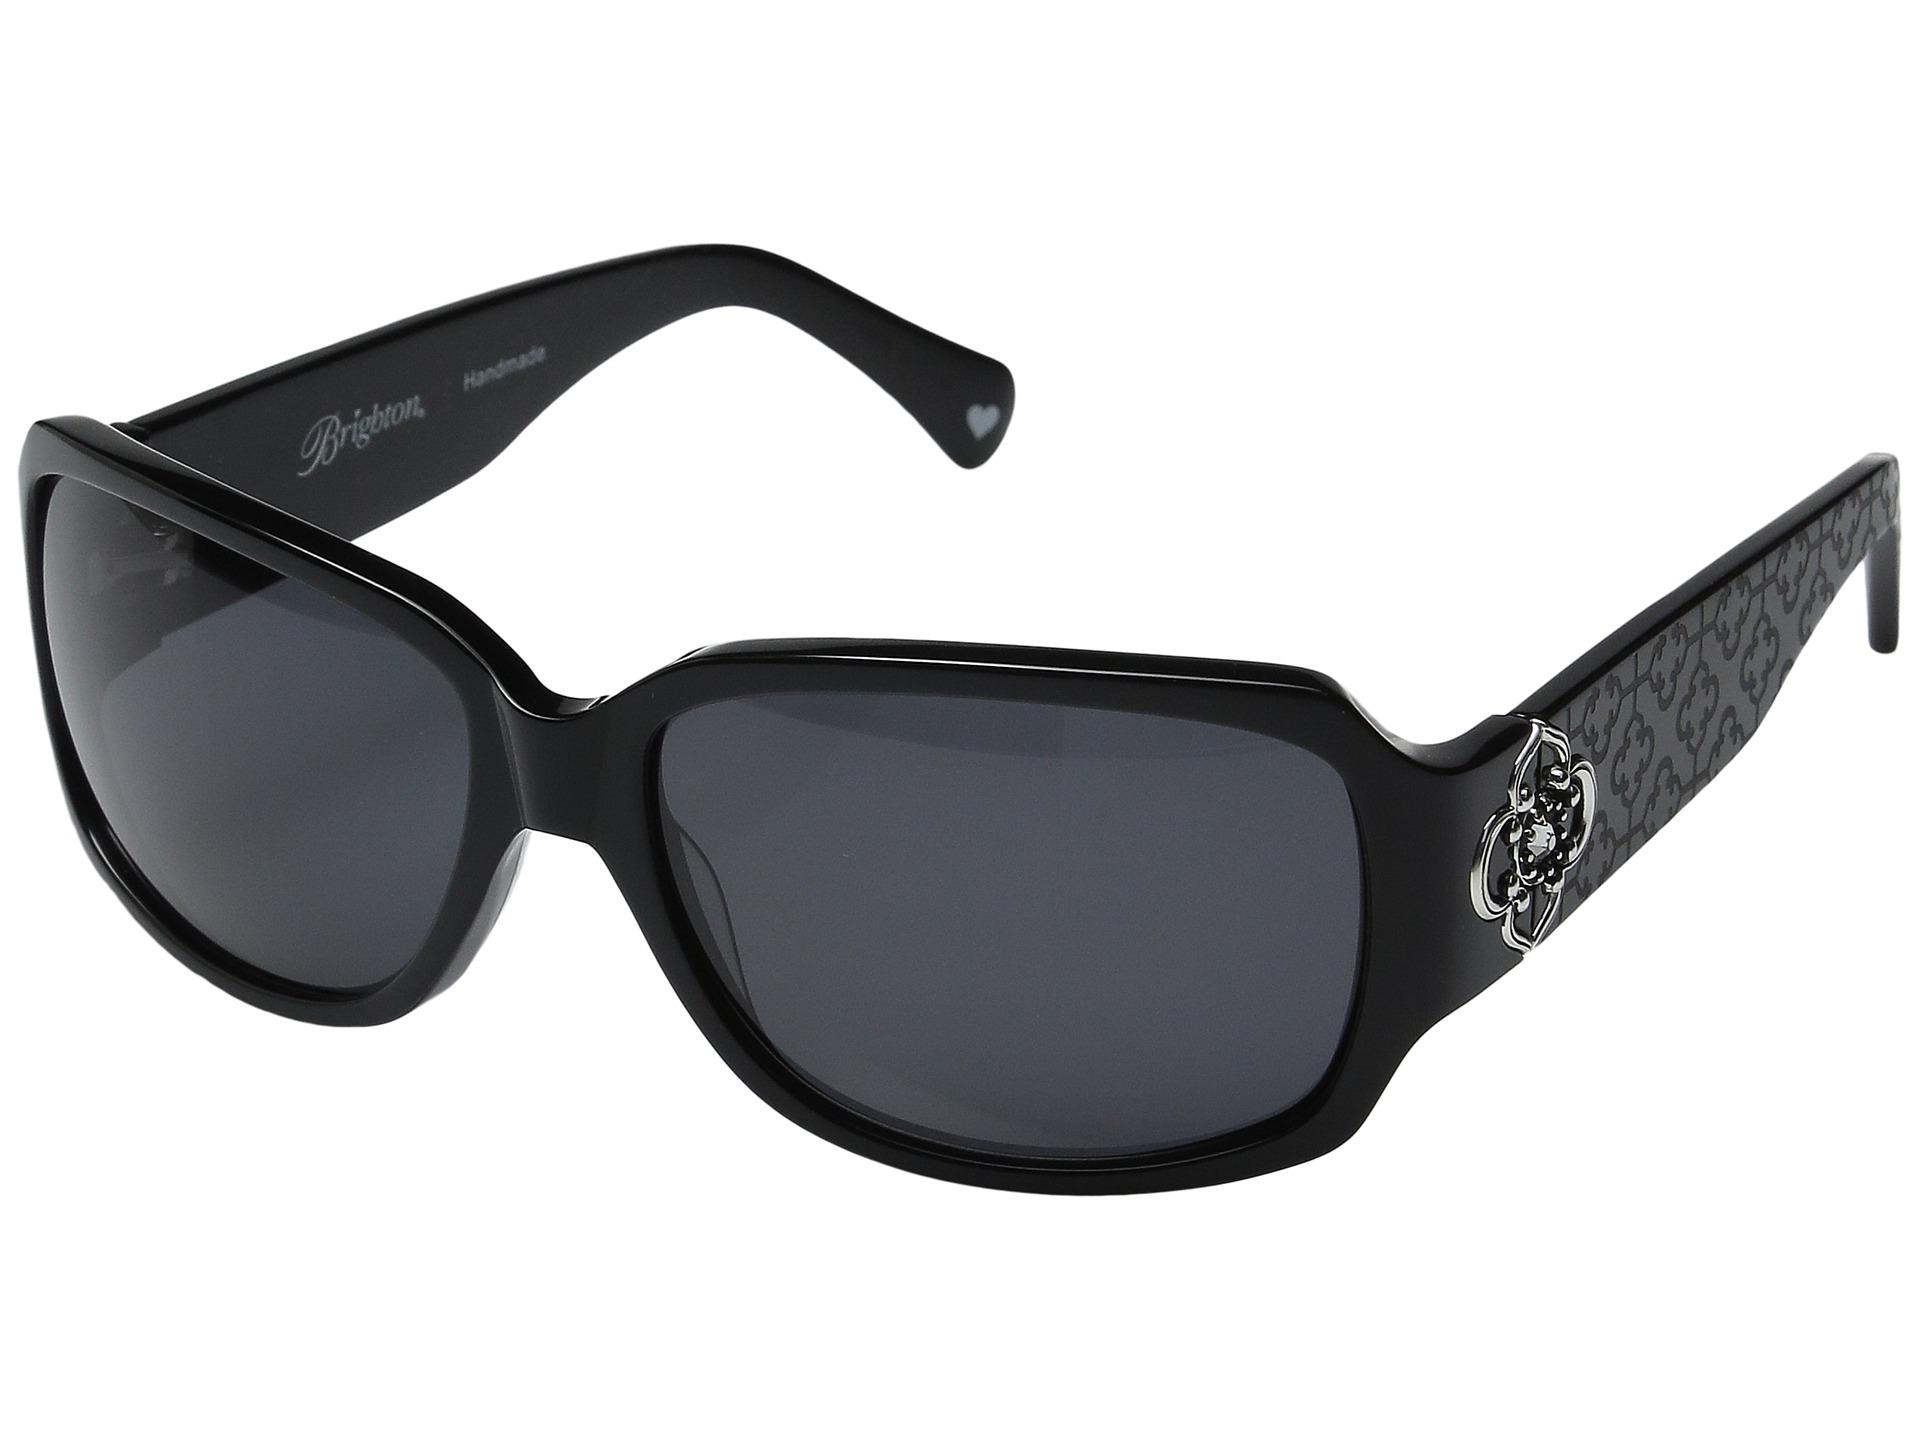 brighton toledo sunglasses at zappos